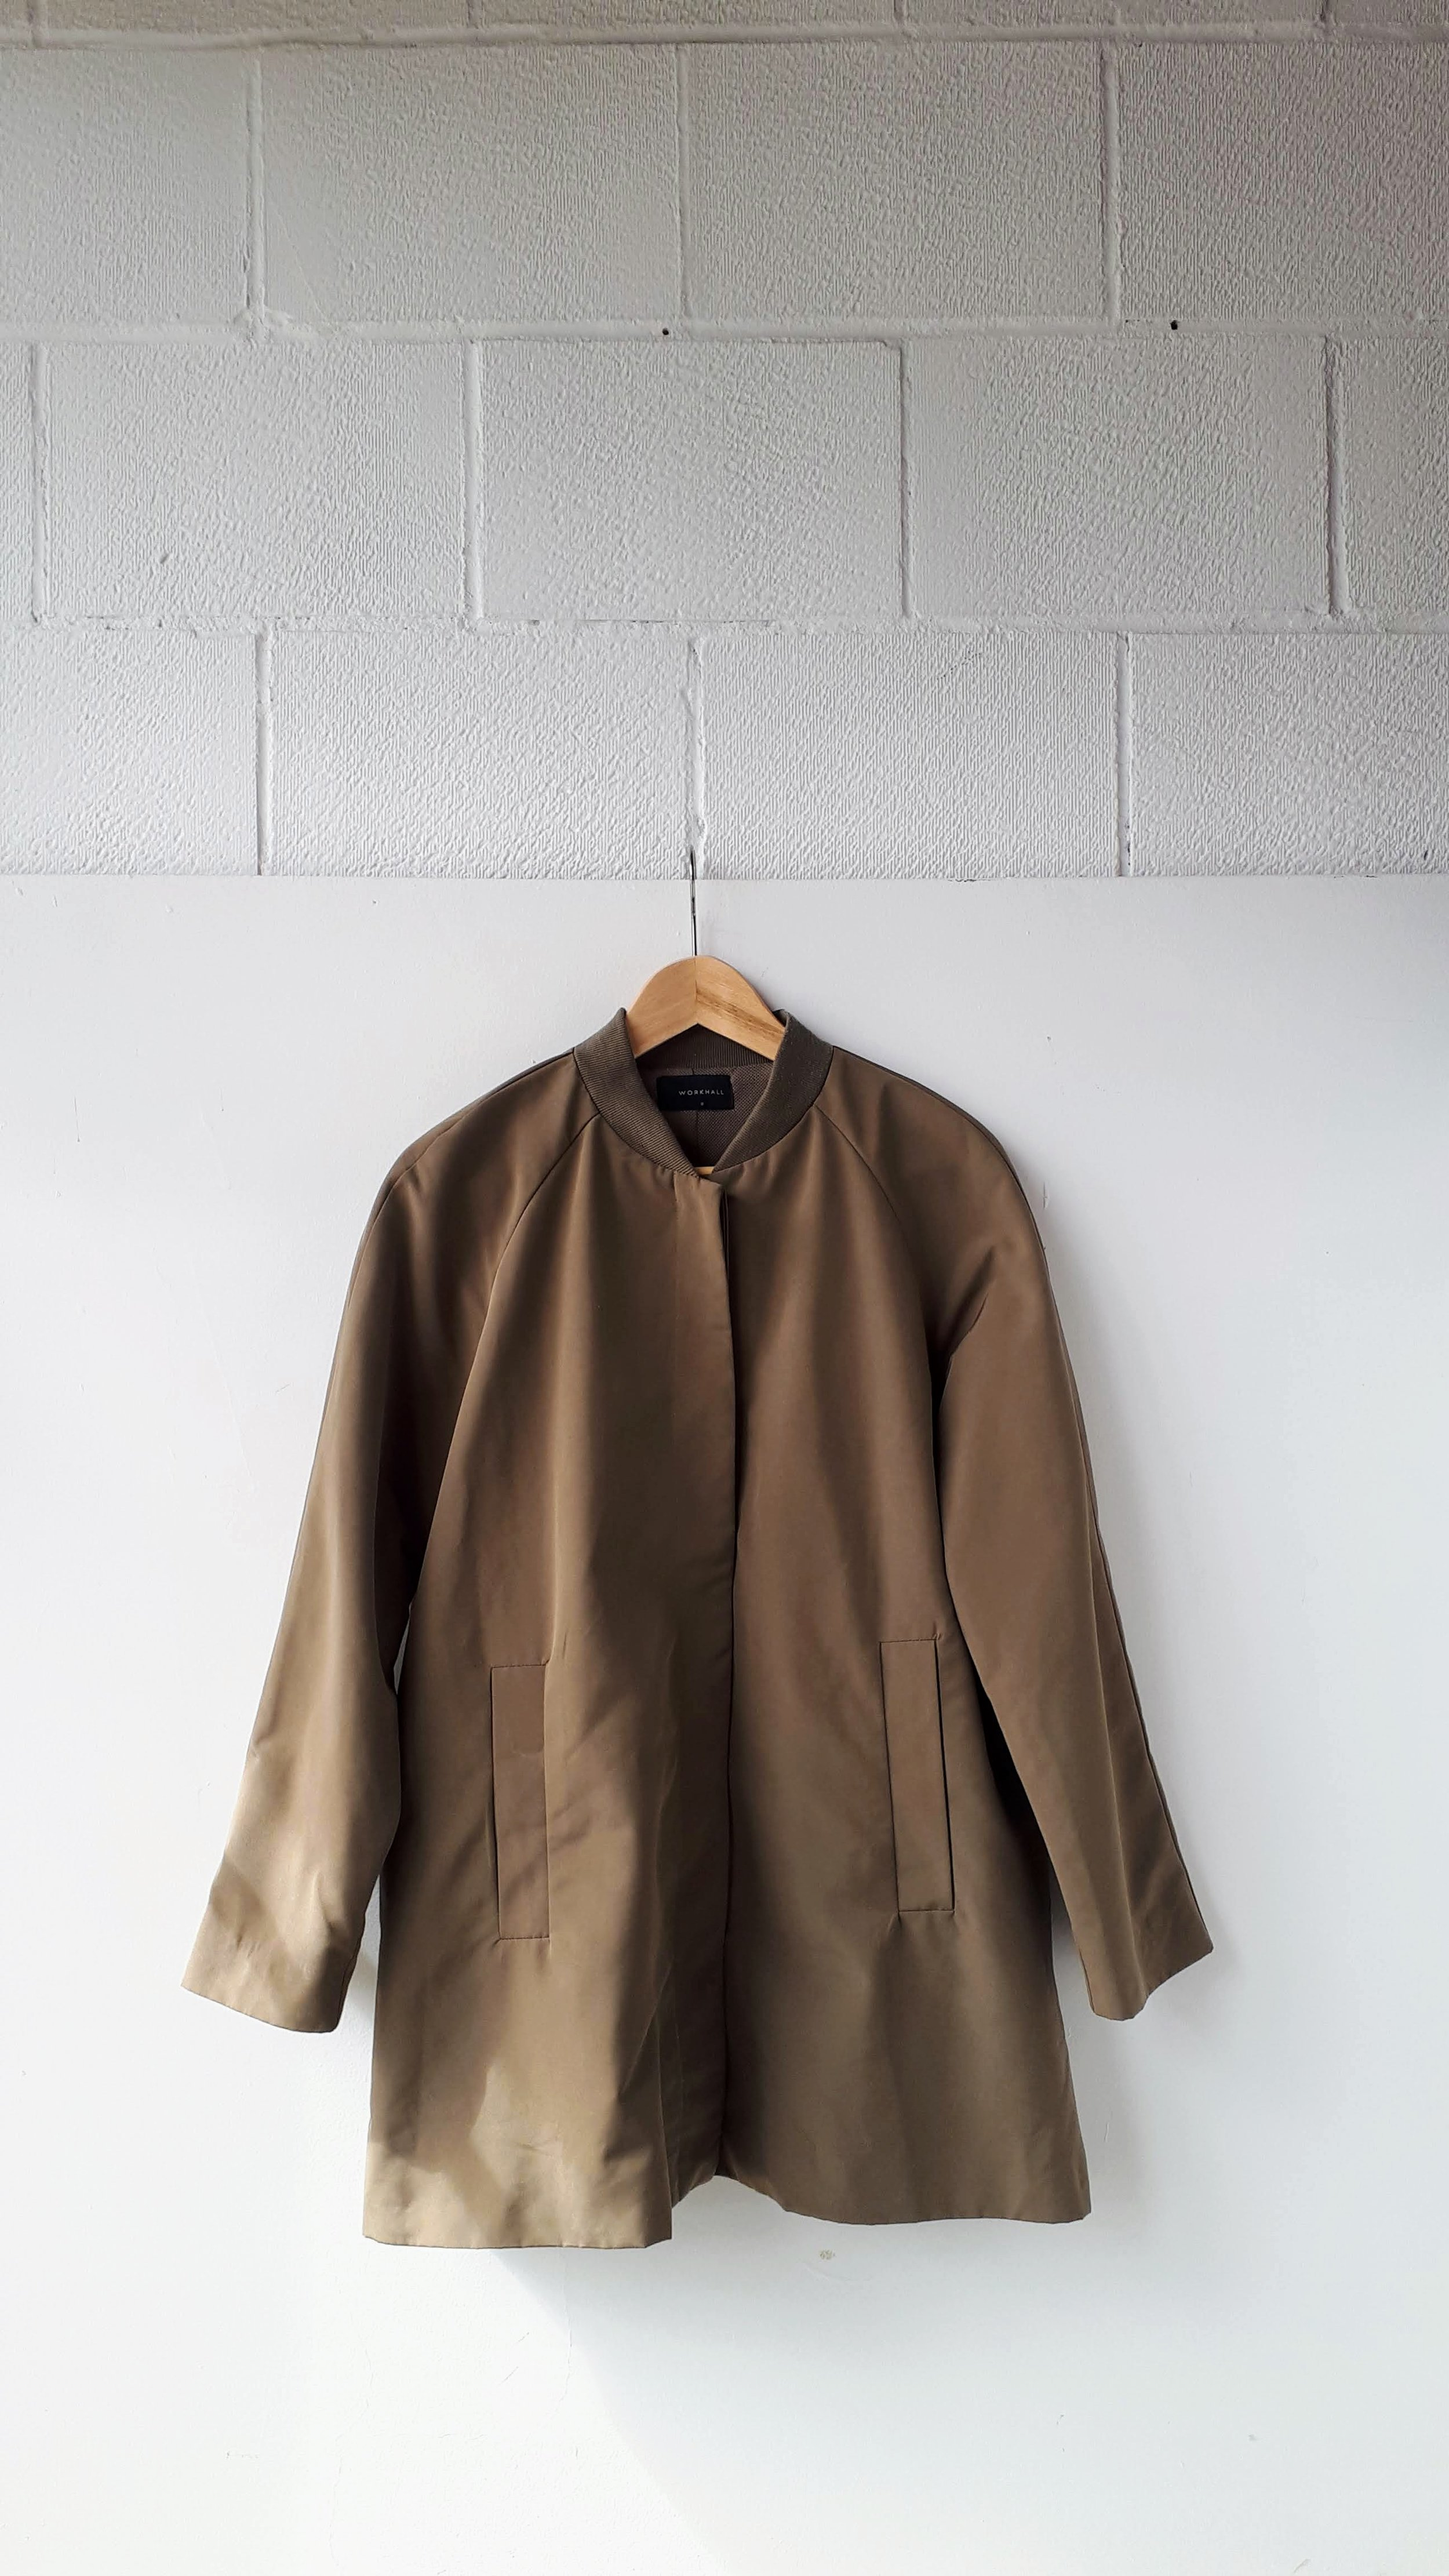 Workhall coat; Size S, $62